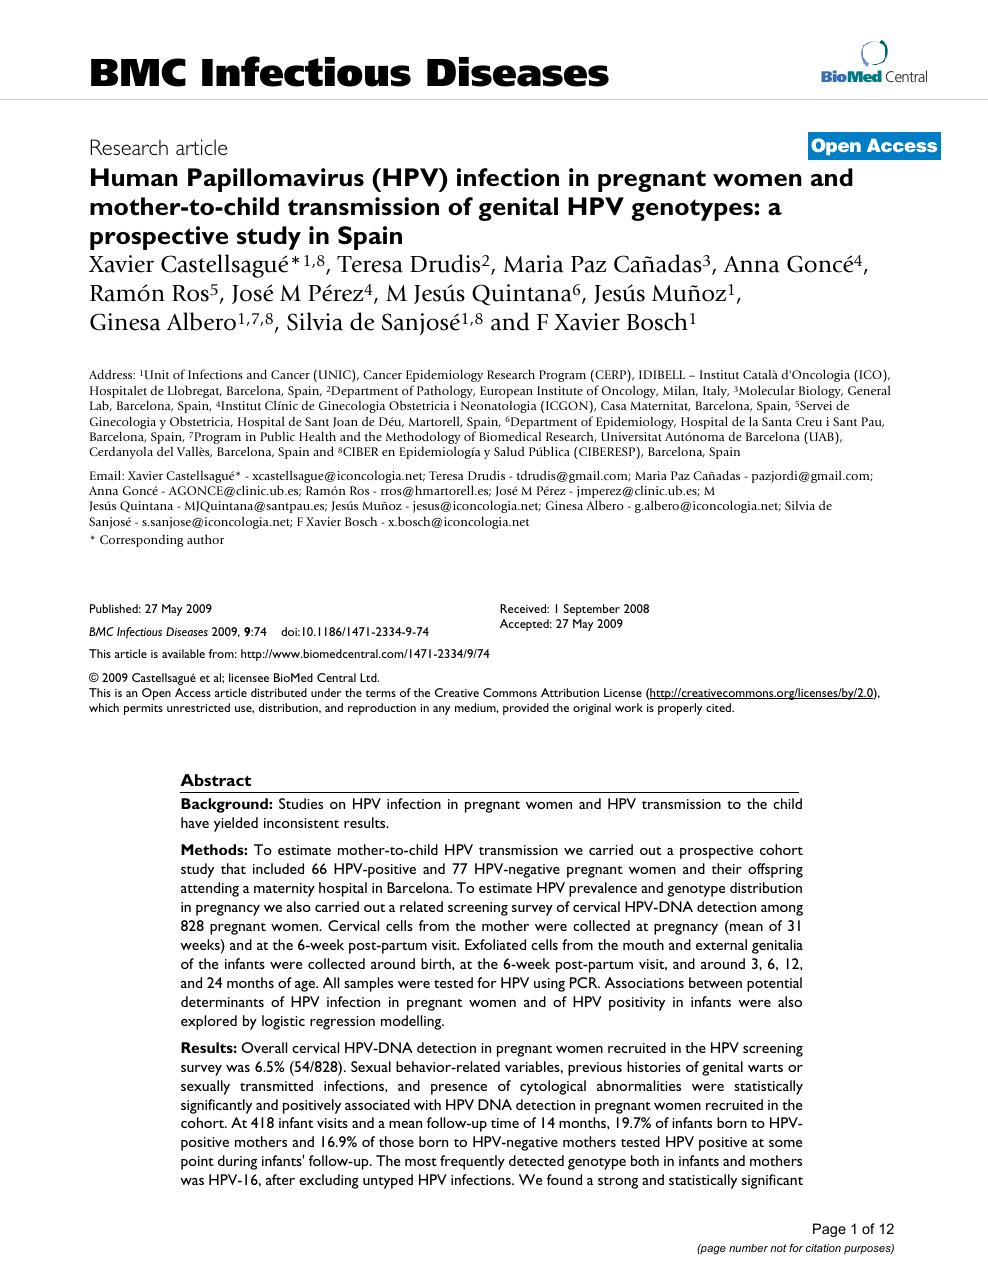 human papillomavirus infection with pregnancy)